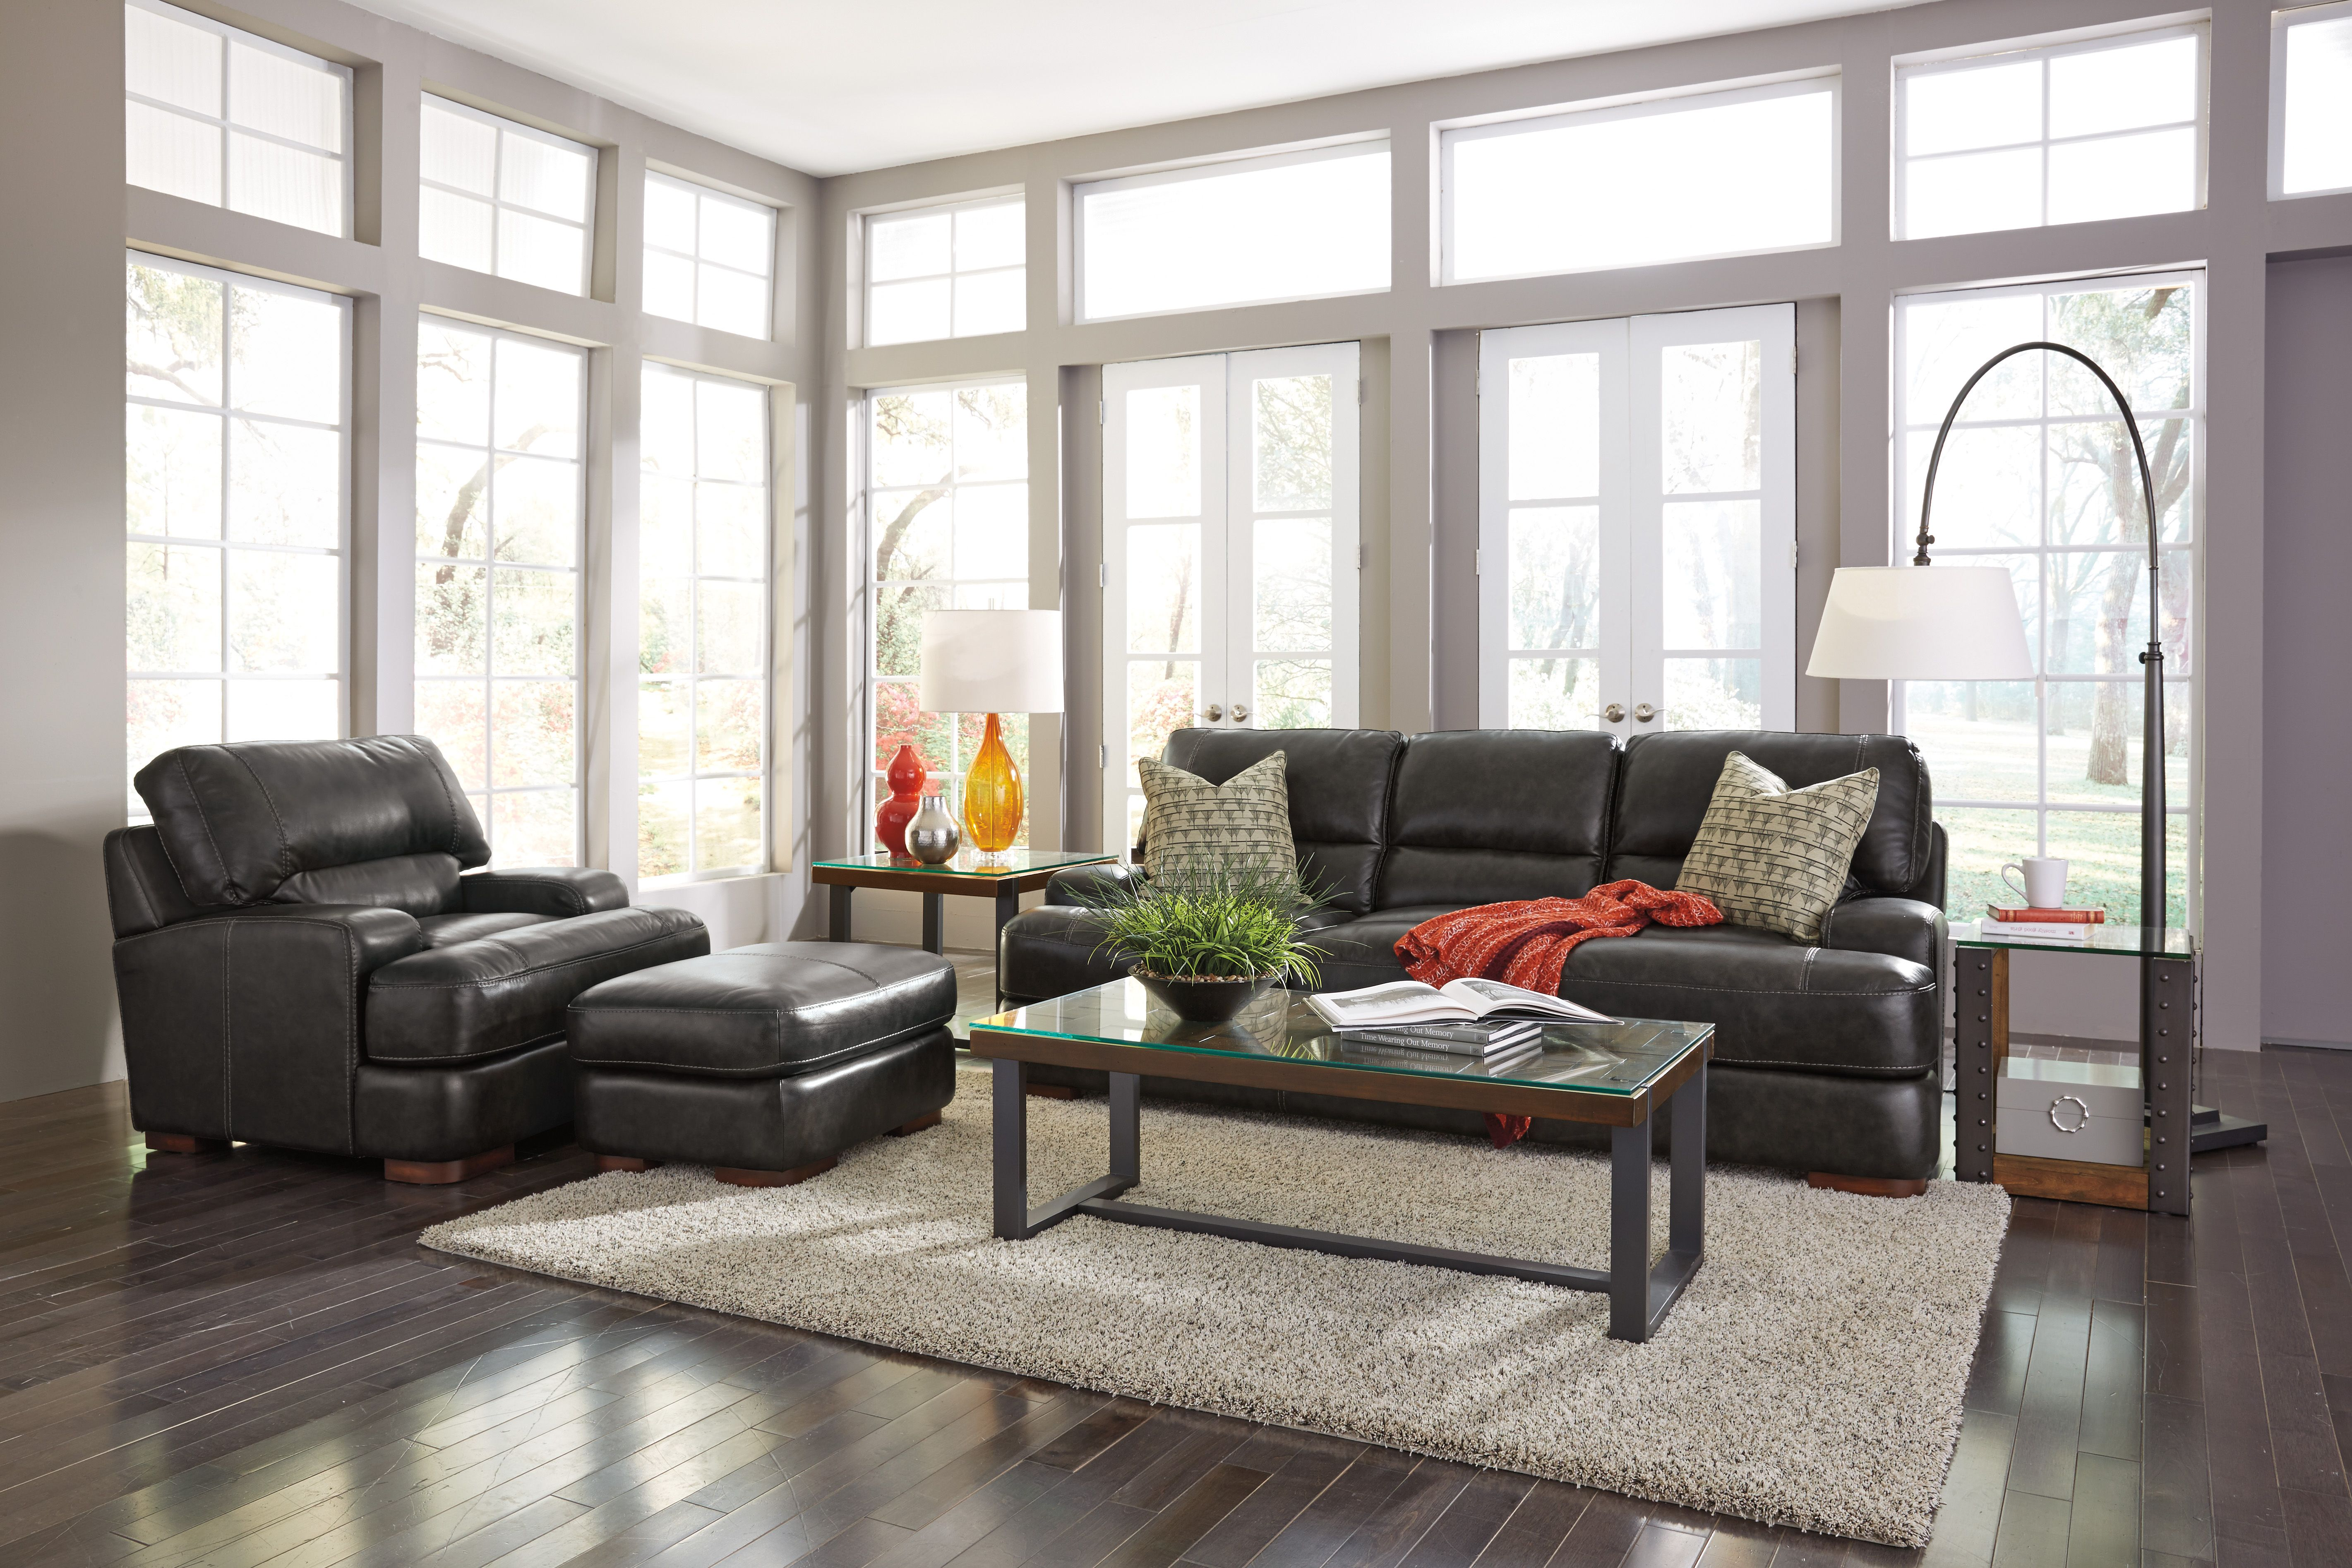 Flexsteel s Jillian sofa group has classic transitional styling